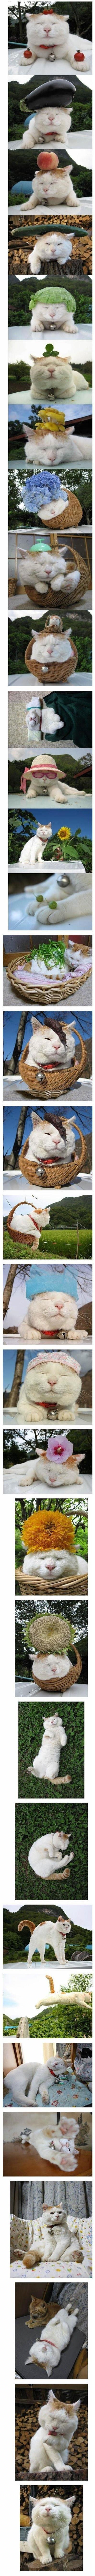 Ze cat. .. Hey you found my cat!